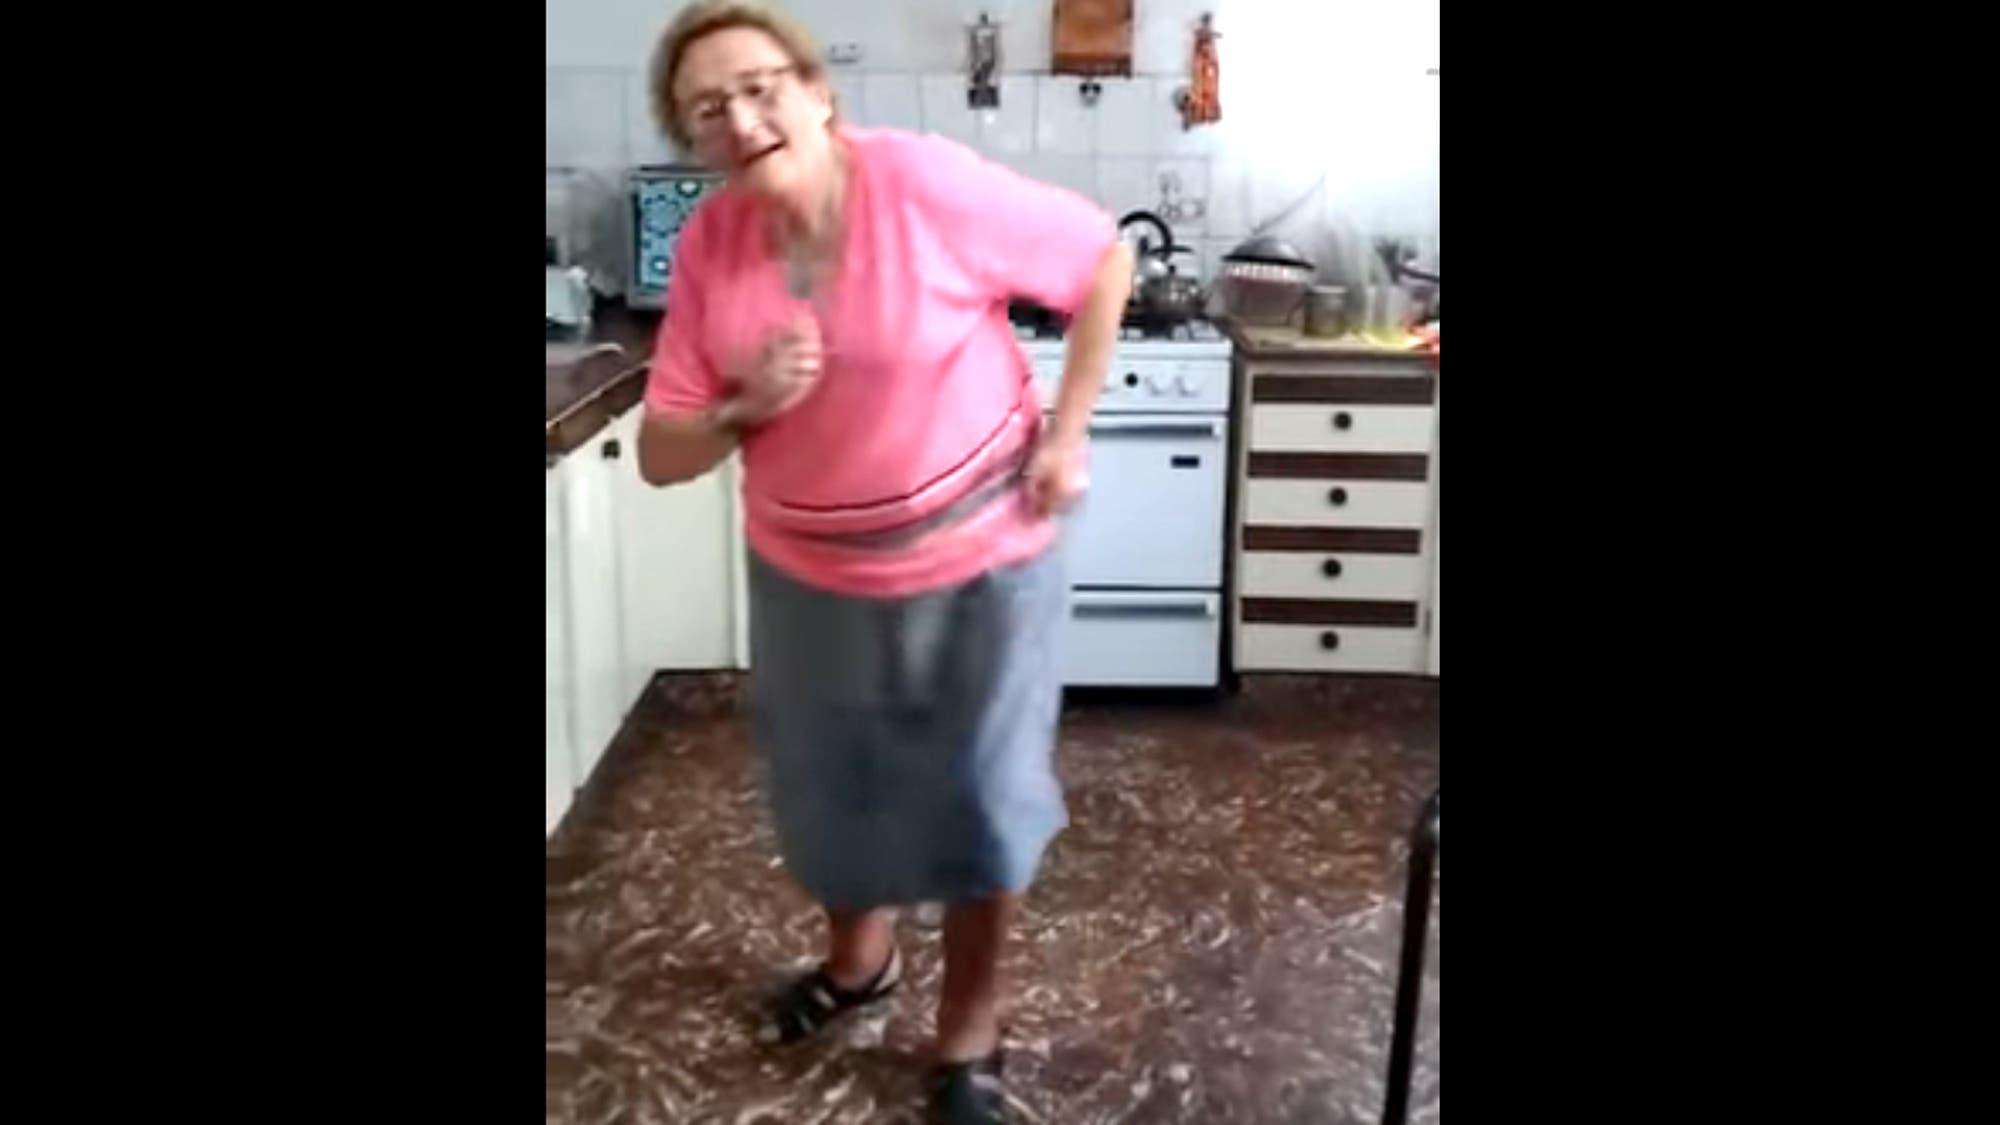 Chispita, la abuela cumbiera que se hizo viral - LA NACION